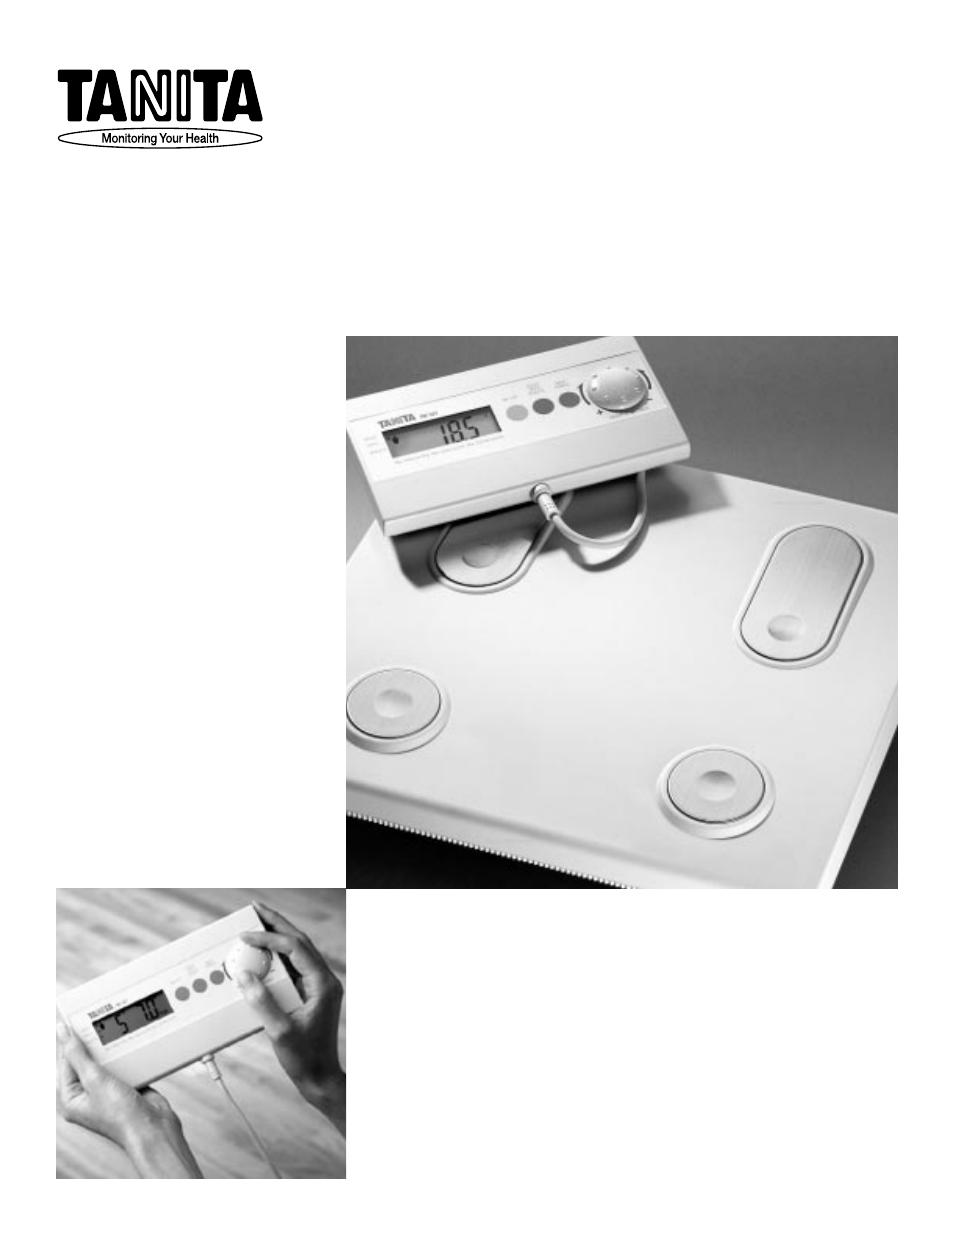 tanita tbf 521 user manual 12 pages rh manualsdir com